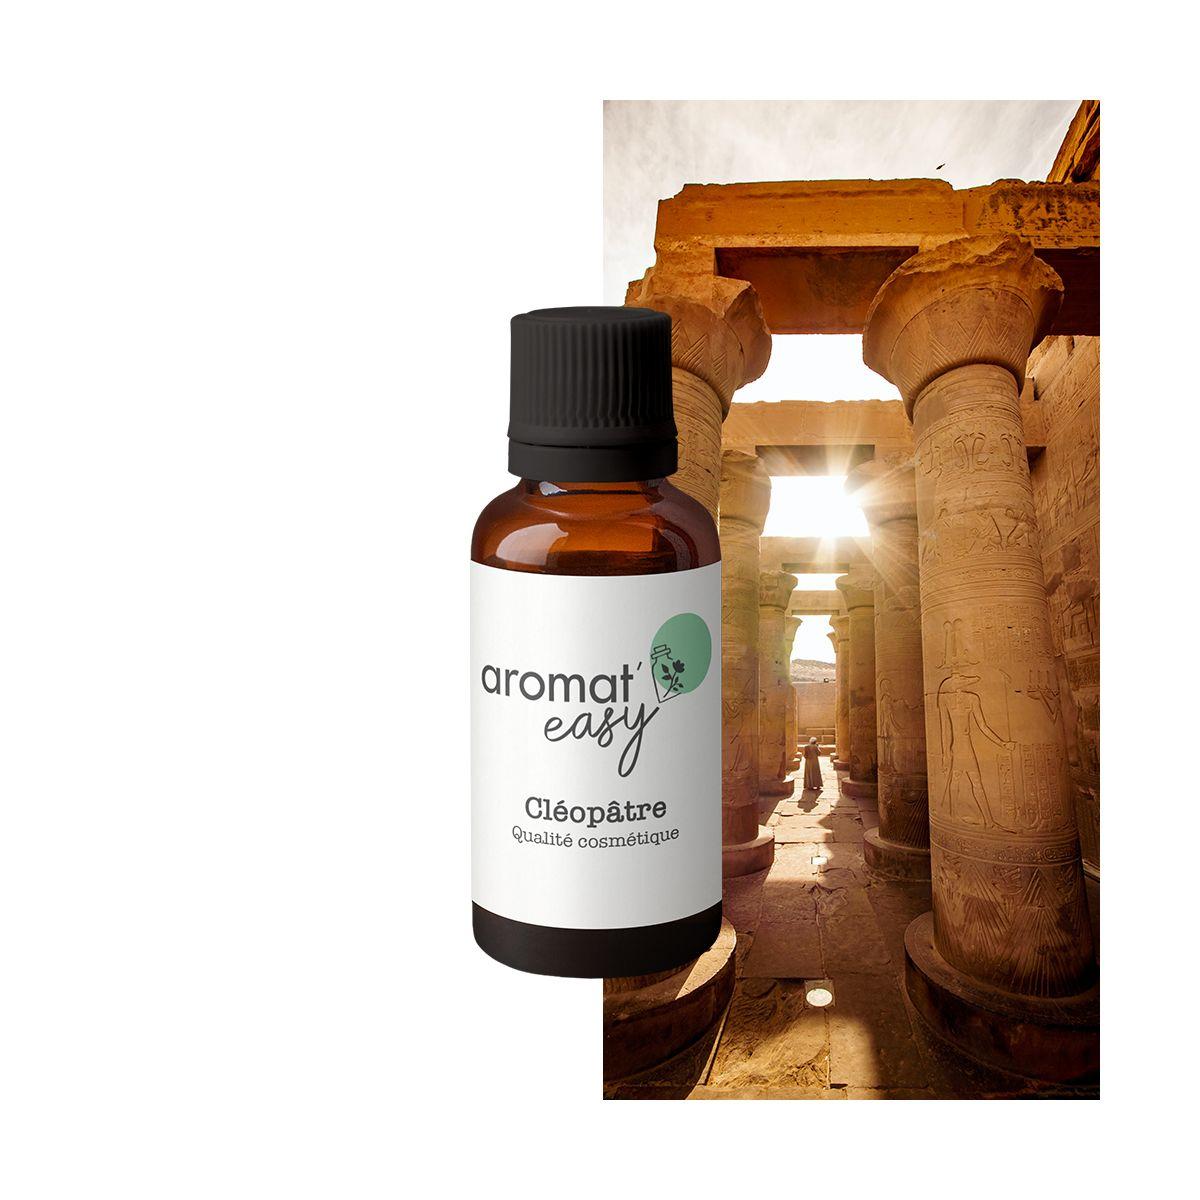 Fragrance Cléopâtre